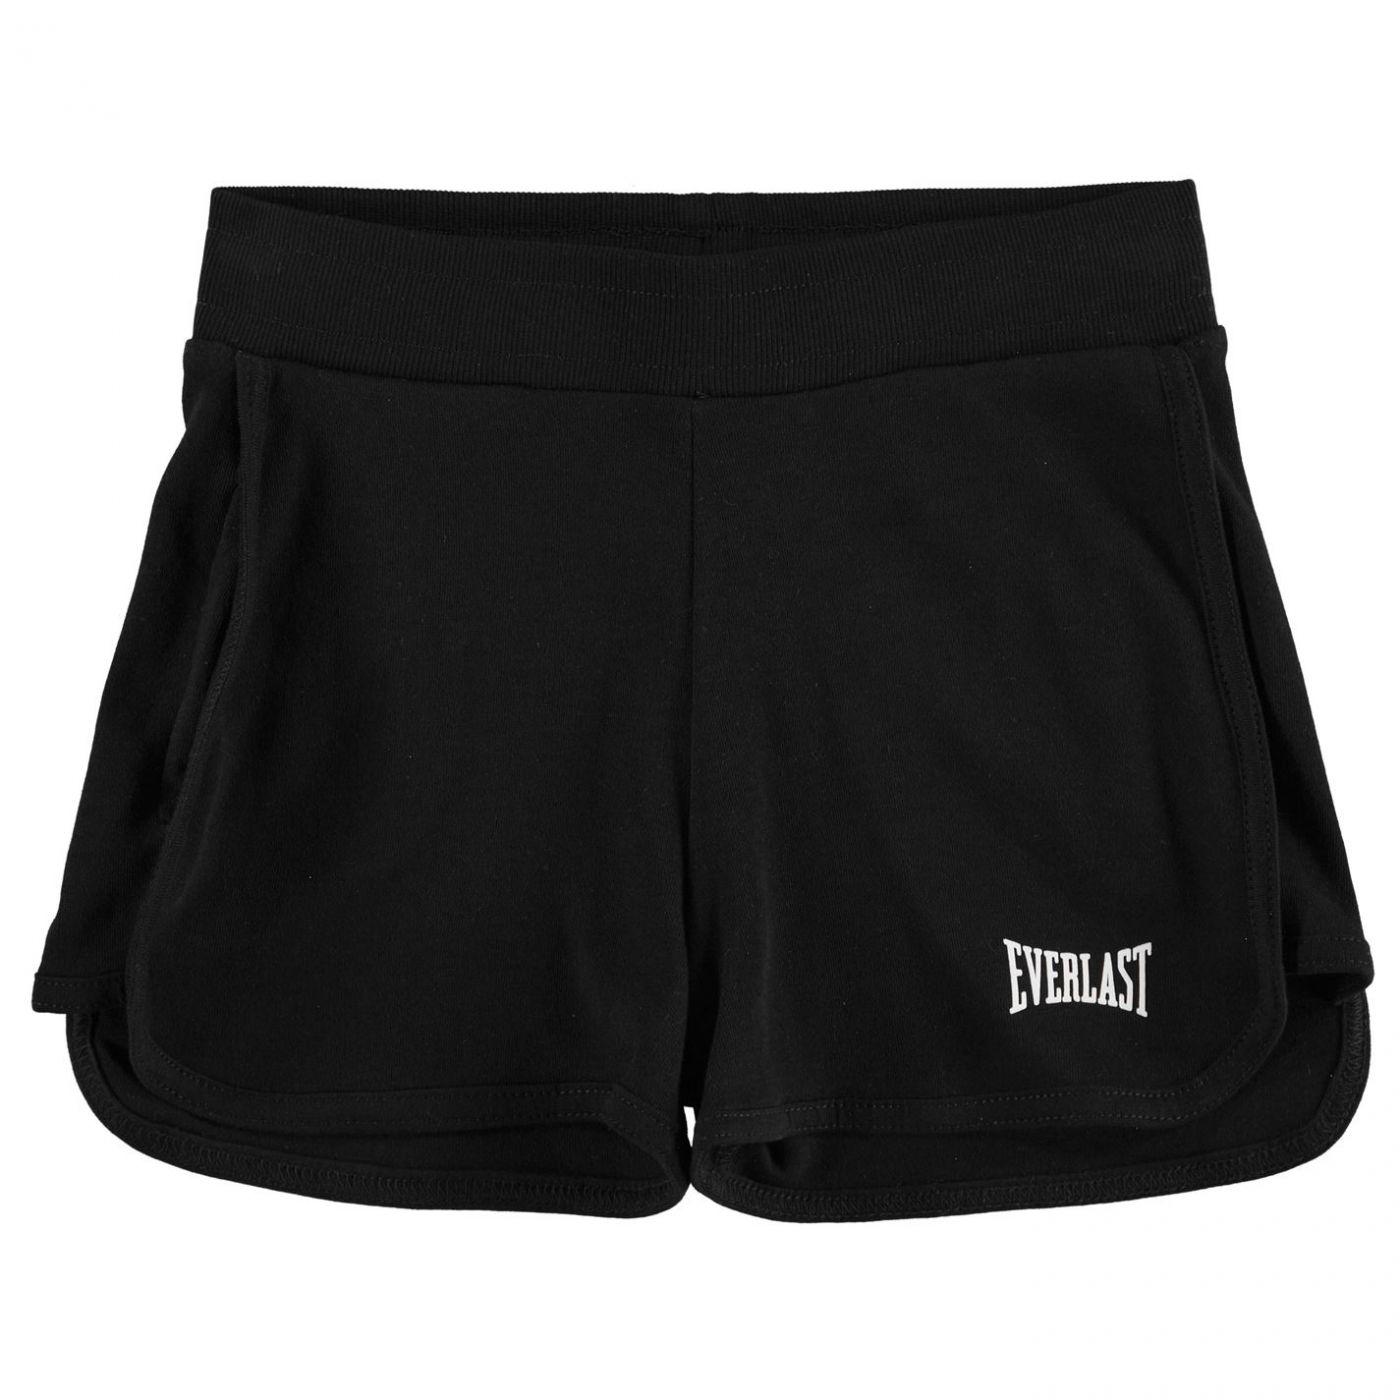 Everlast Junior Girls Fleece Shorts